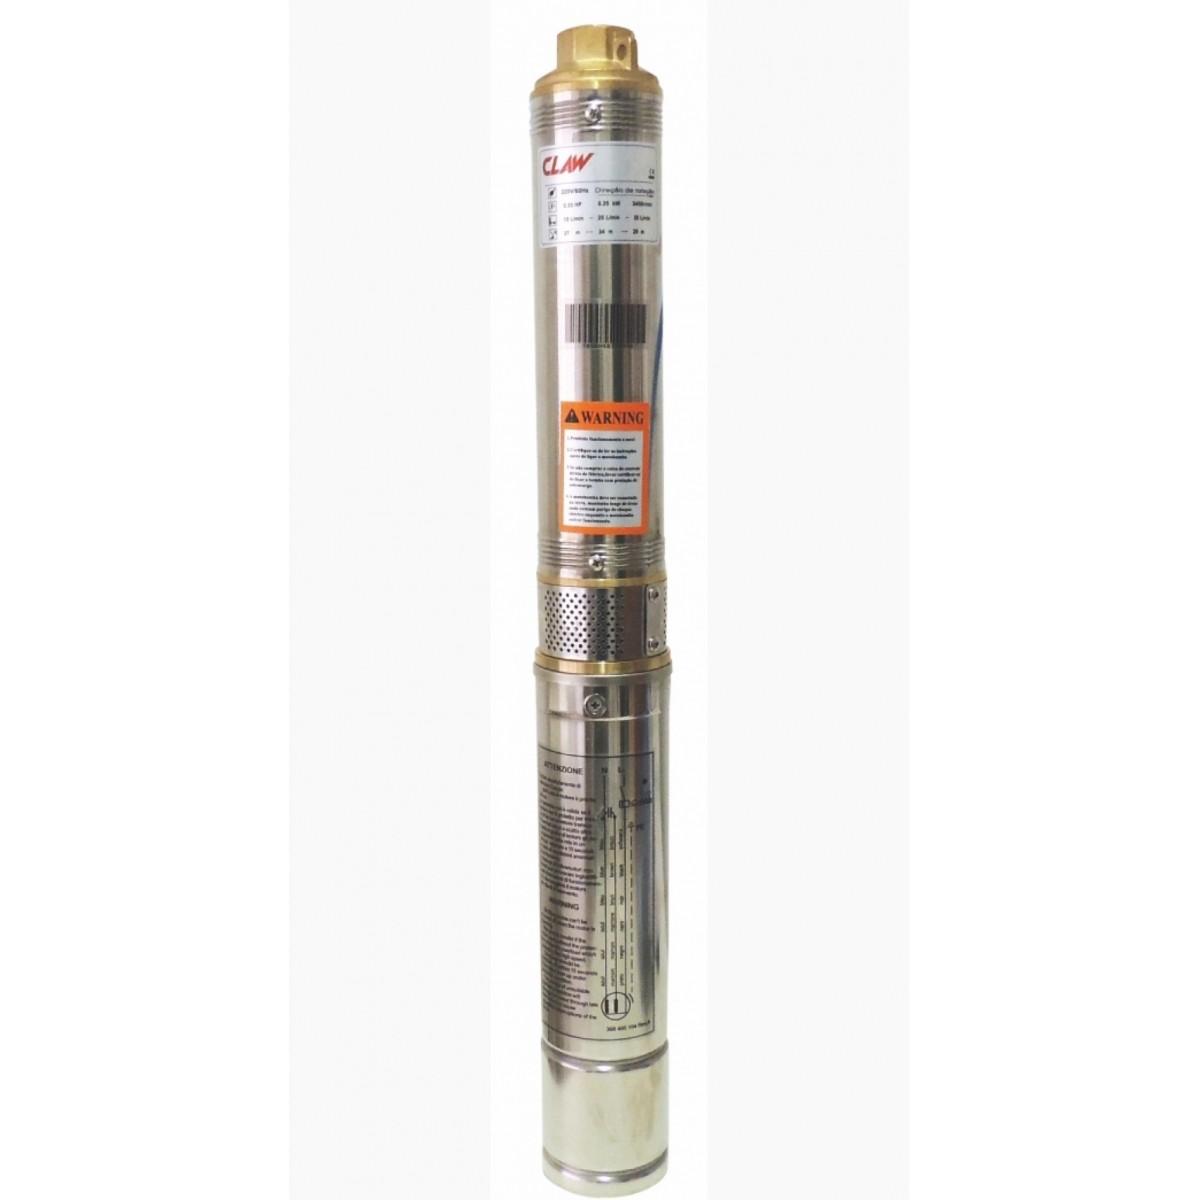 Bomba Poço Artesiano 63mm (2,5 Polegadas) 1/3HP Até 50 Metros Venda Exclusiva